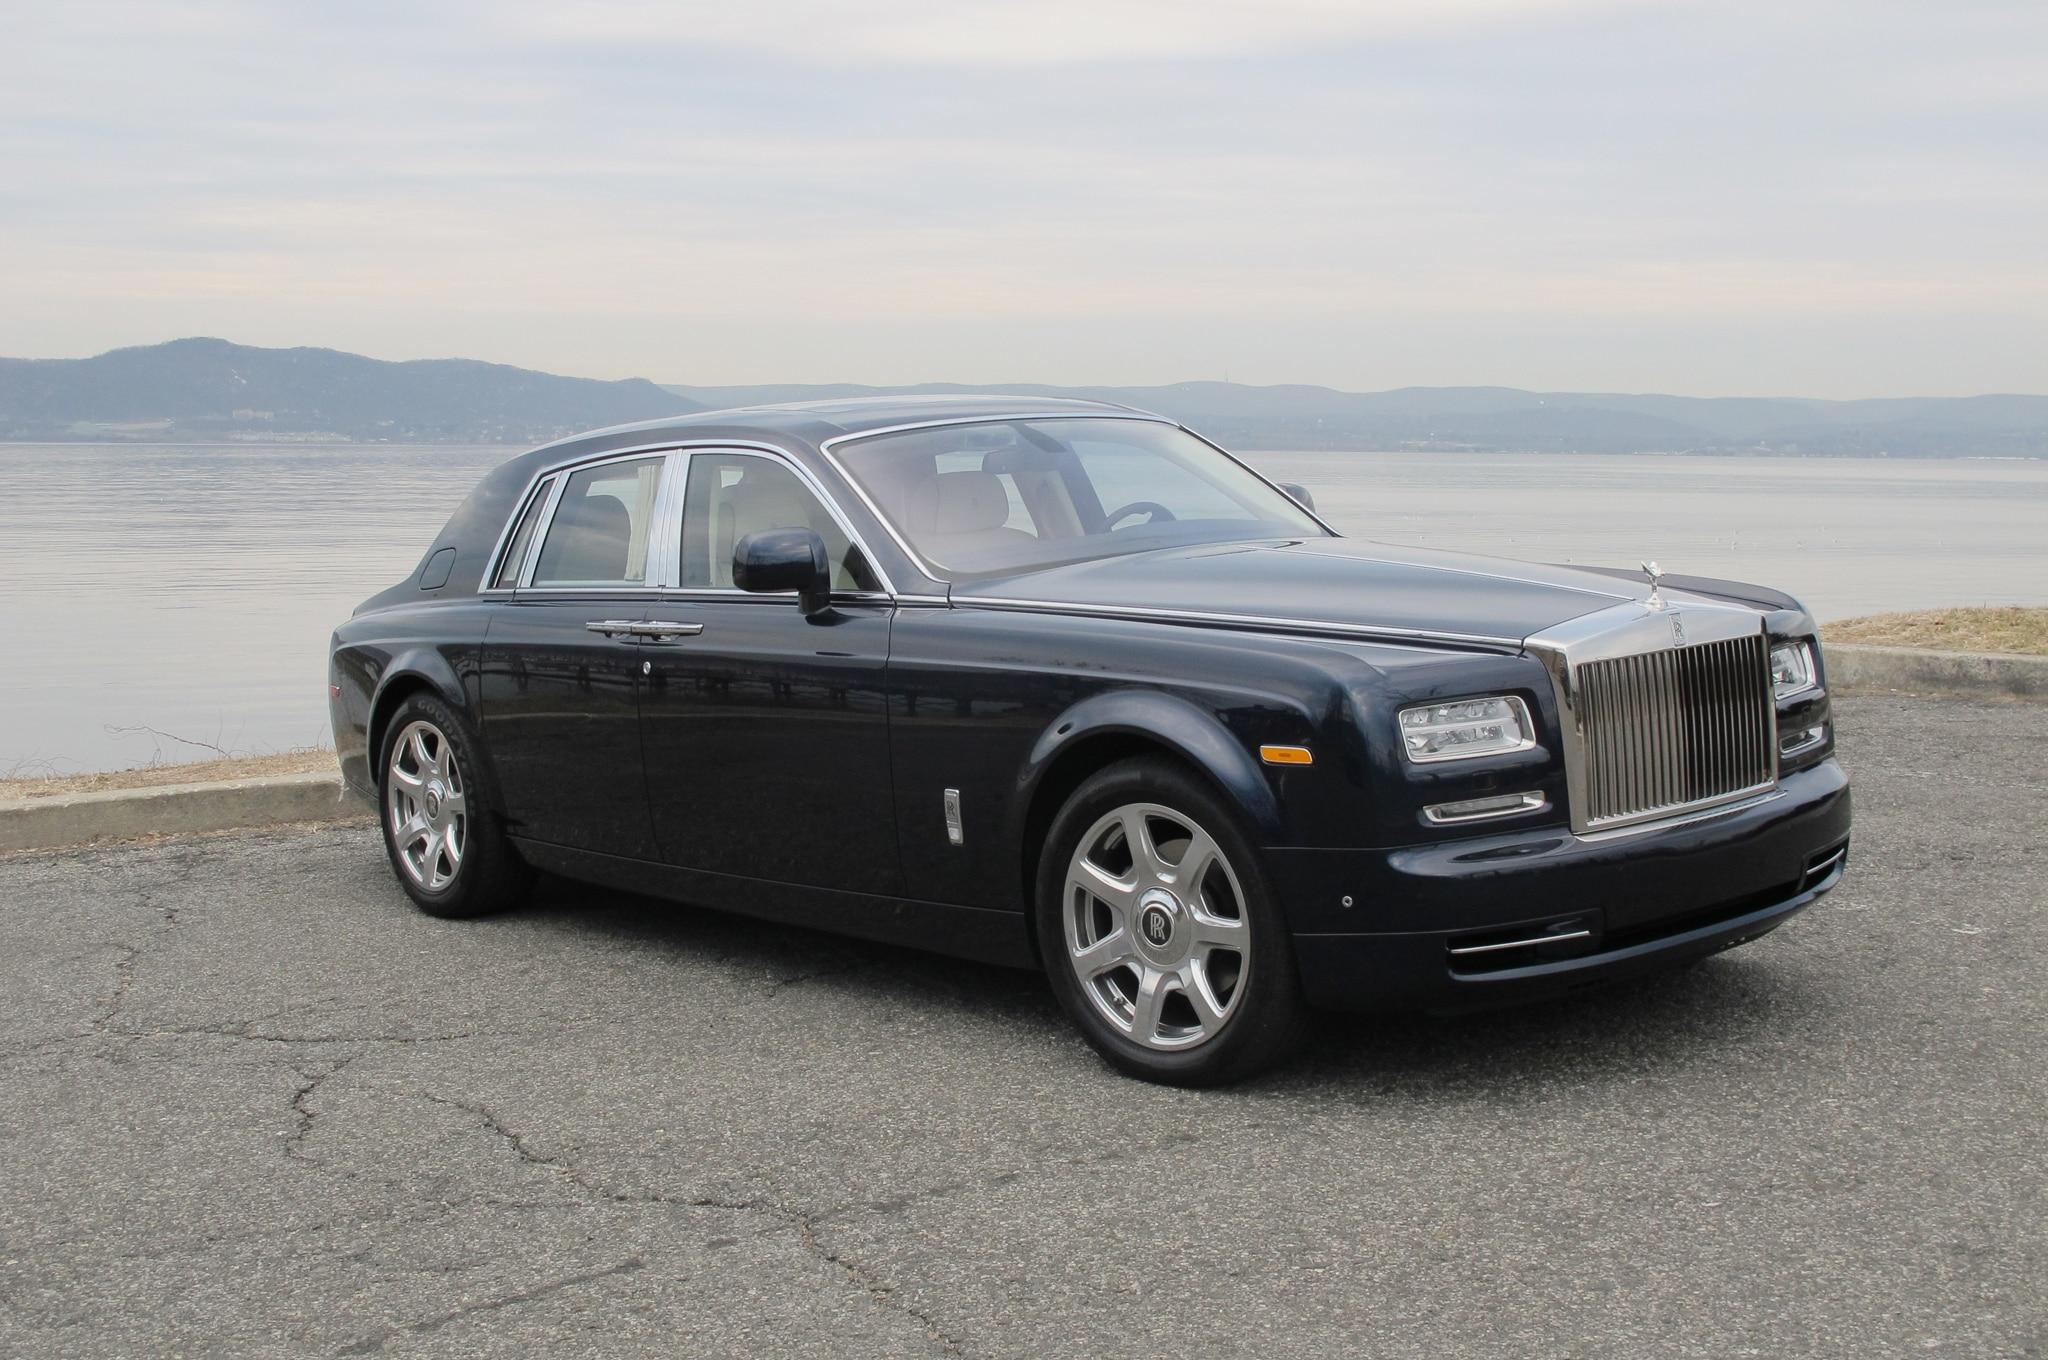 2014 Rolls Royce Phantom Front Three Quarters